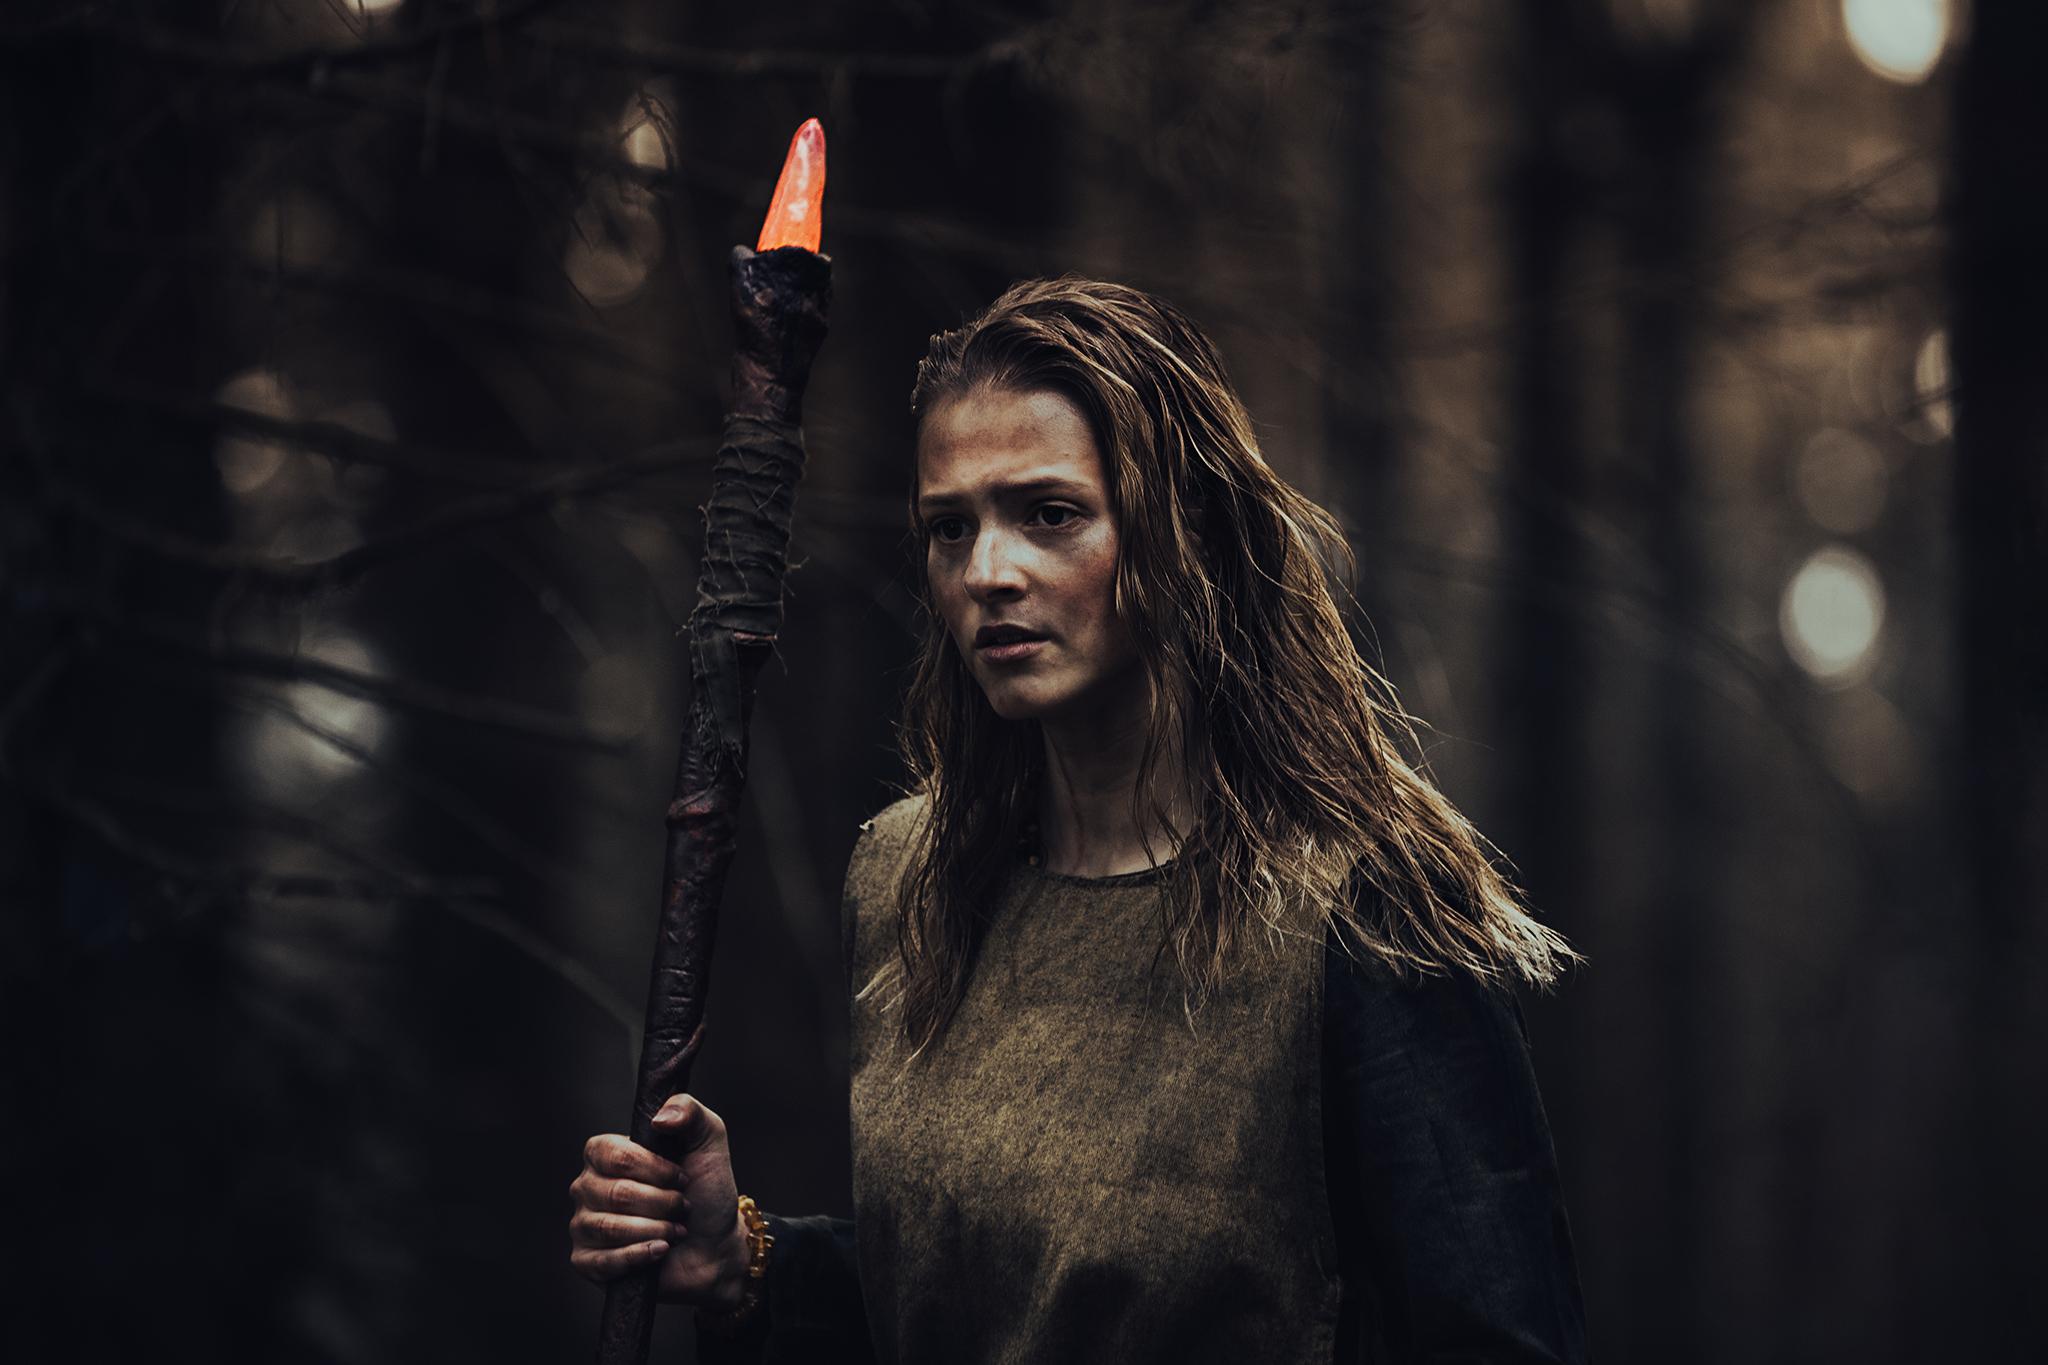 Lead actress Tamara Sedlmeir-Leutenstorfer as 'Lotte' in Black Forest Witch